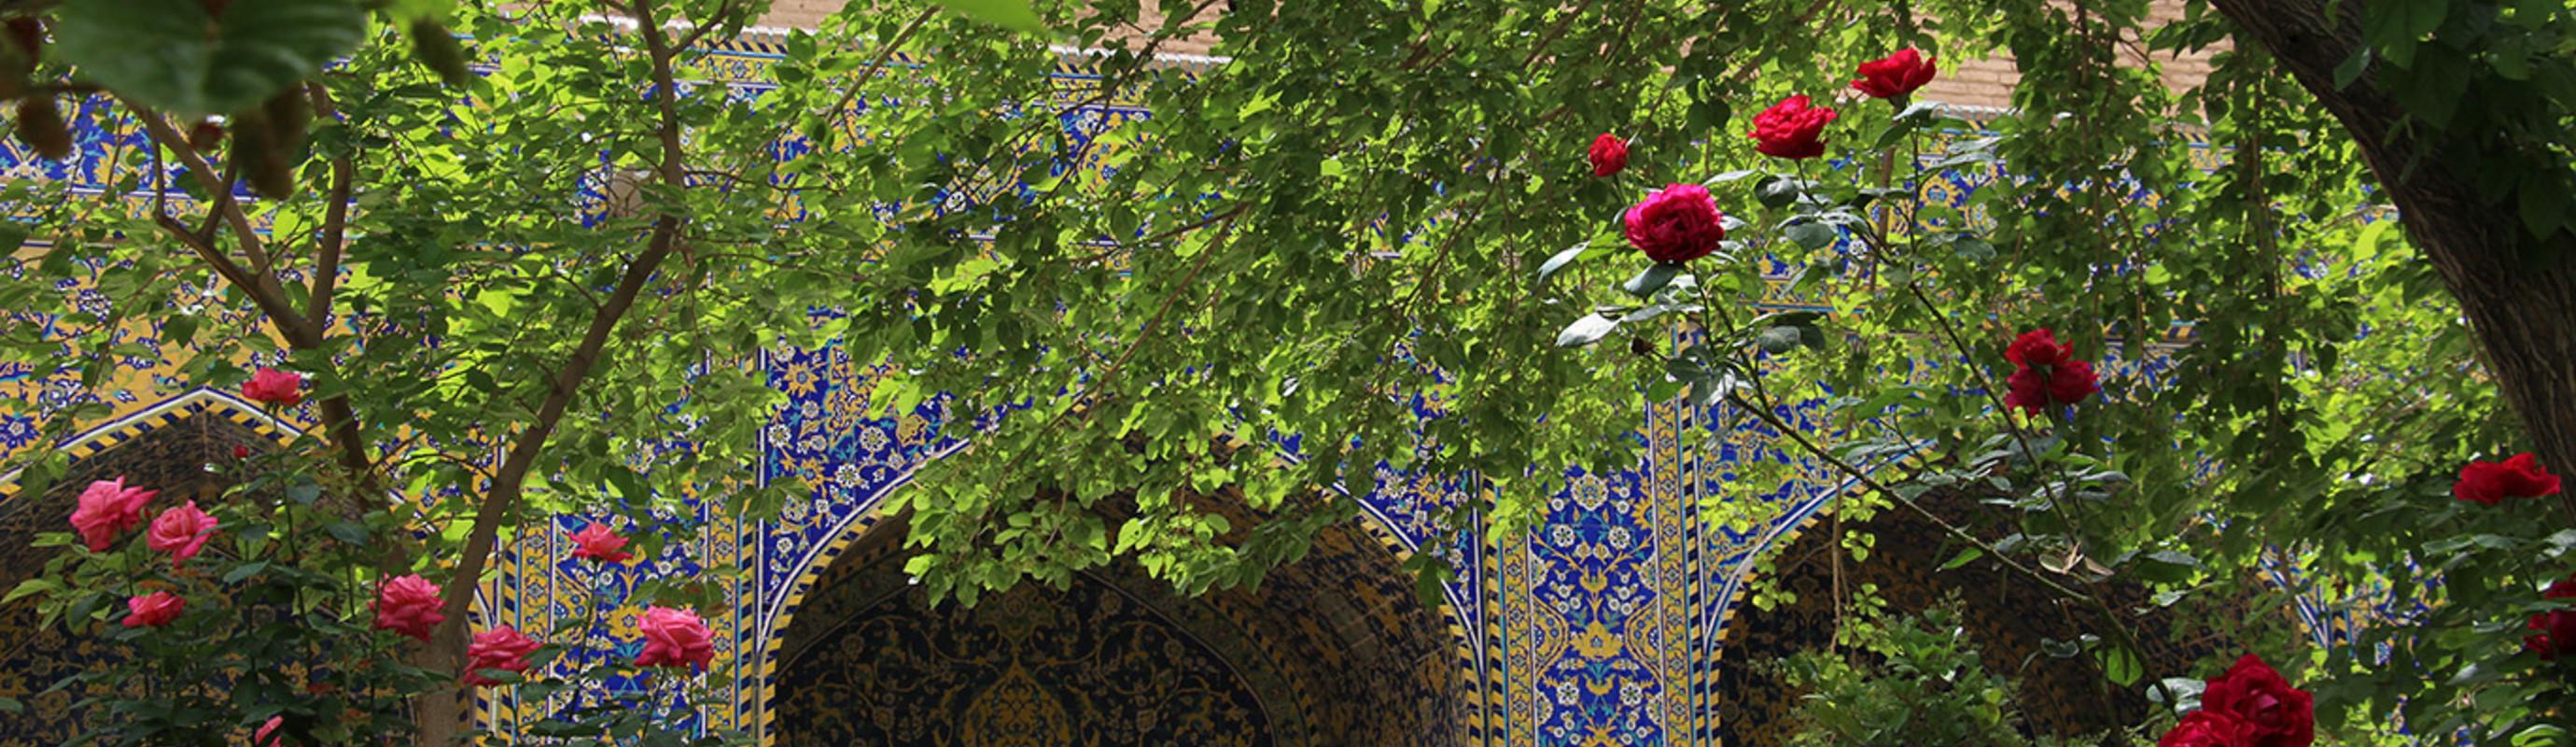 Ziarat Imam Zaman (ATFS) gereciteerd door Seyedzyaoddin Salehi Khansari tijdens Ramadhan 2020.